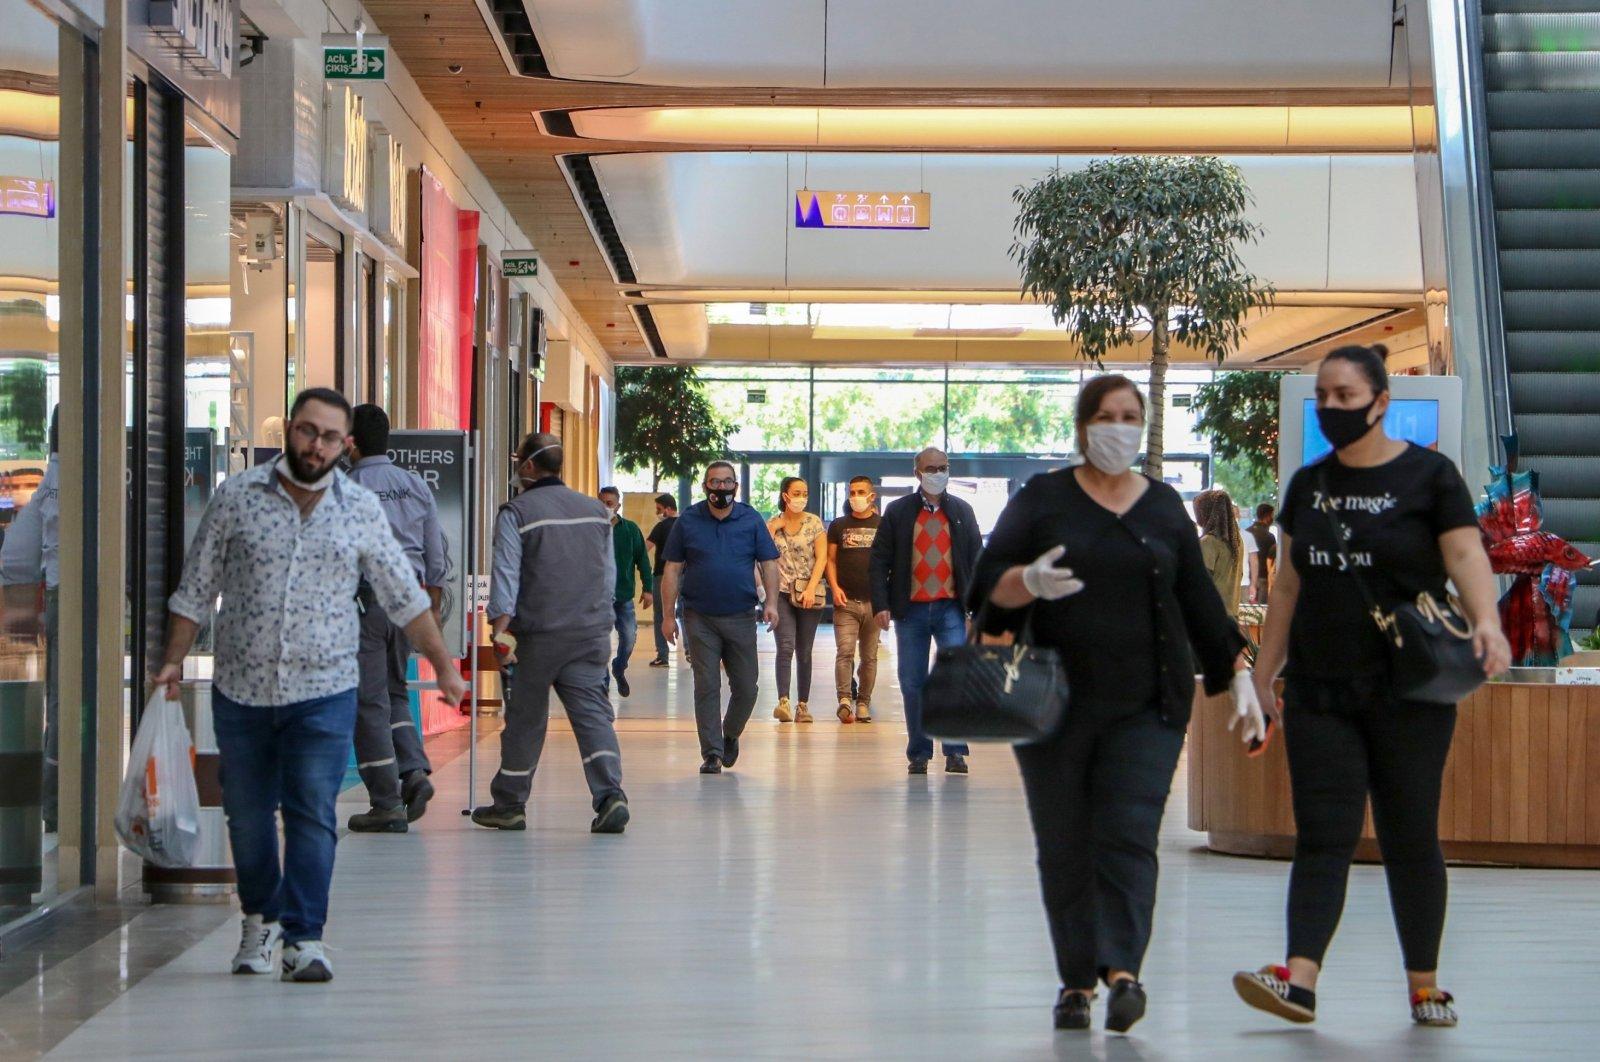 People wearing protective masks walk inside a shopping mall in Antalya, southern Turkey, May 13, 2020. (DHA Photo)